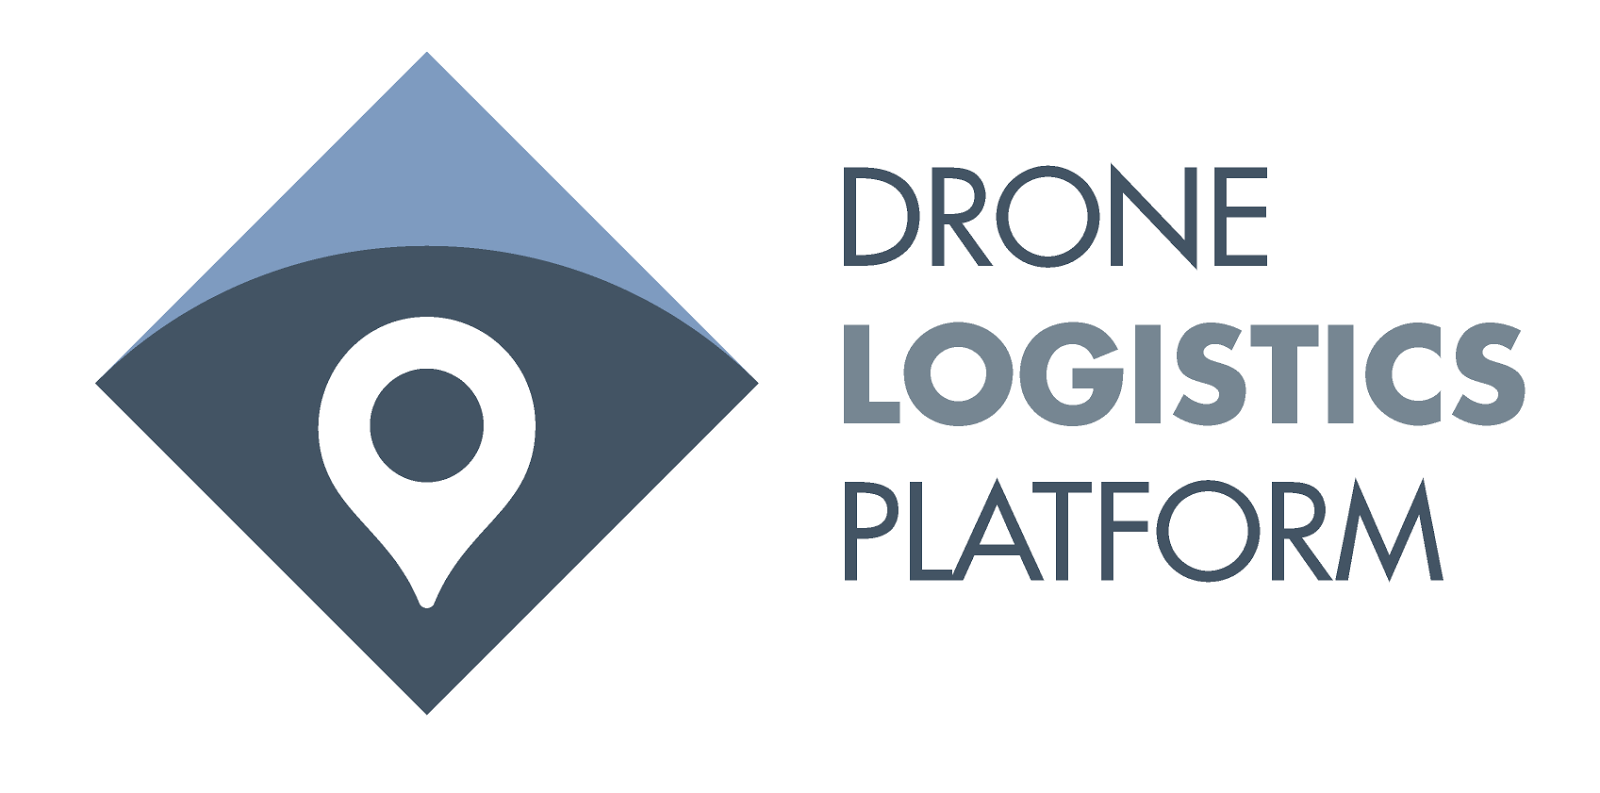 Drone Logistics Platform